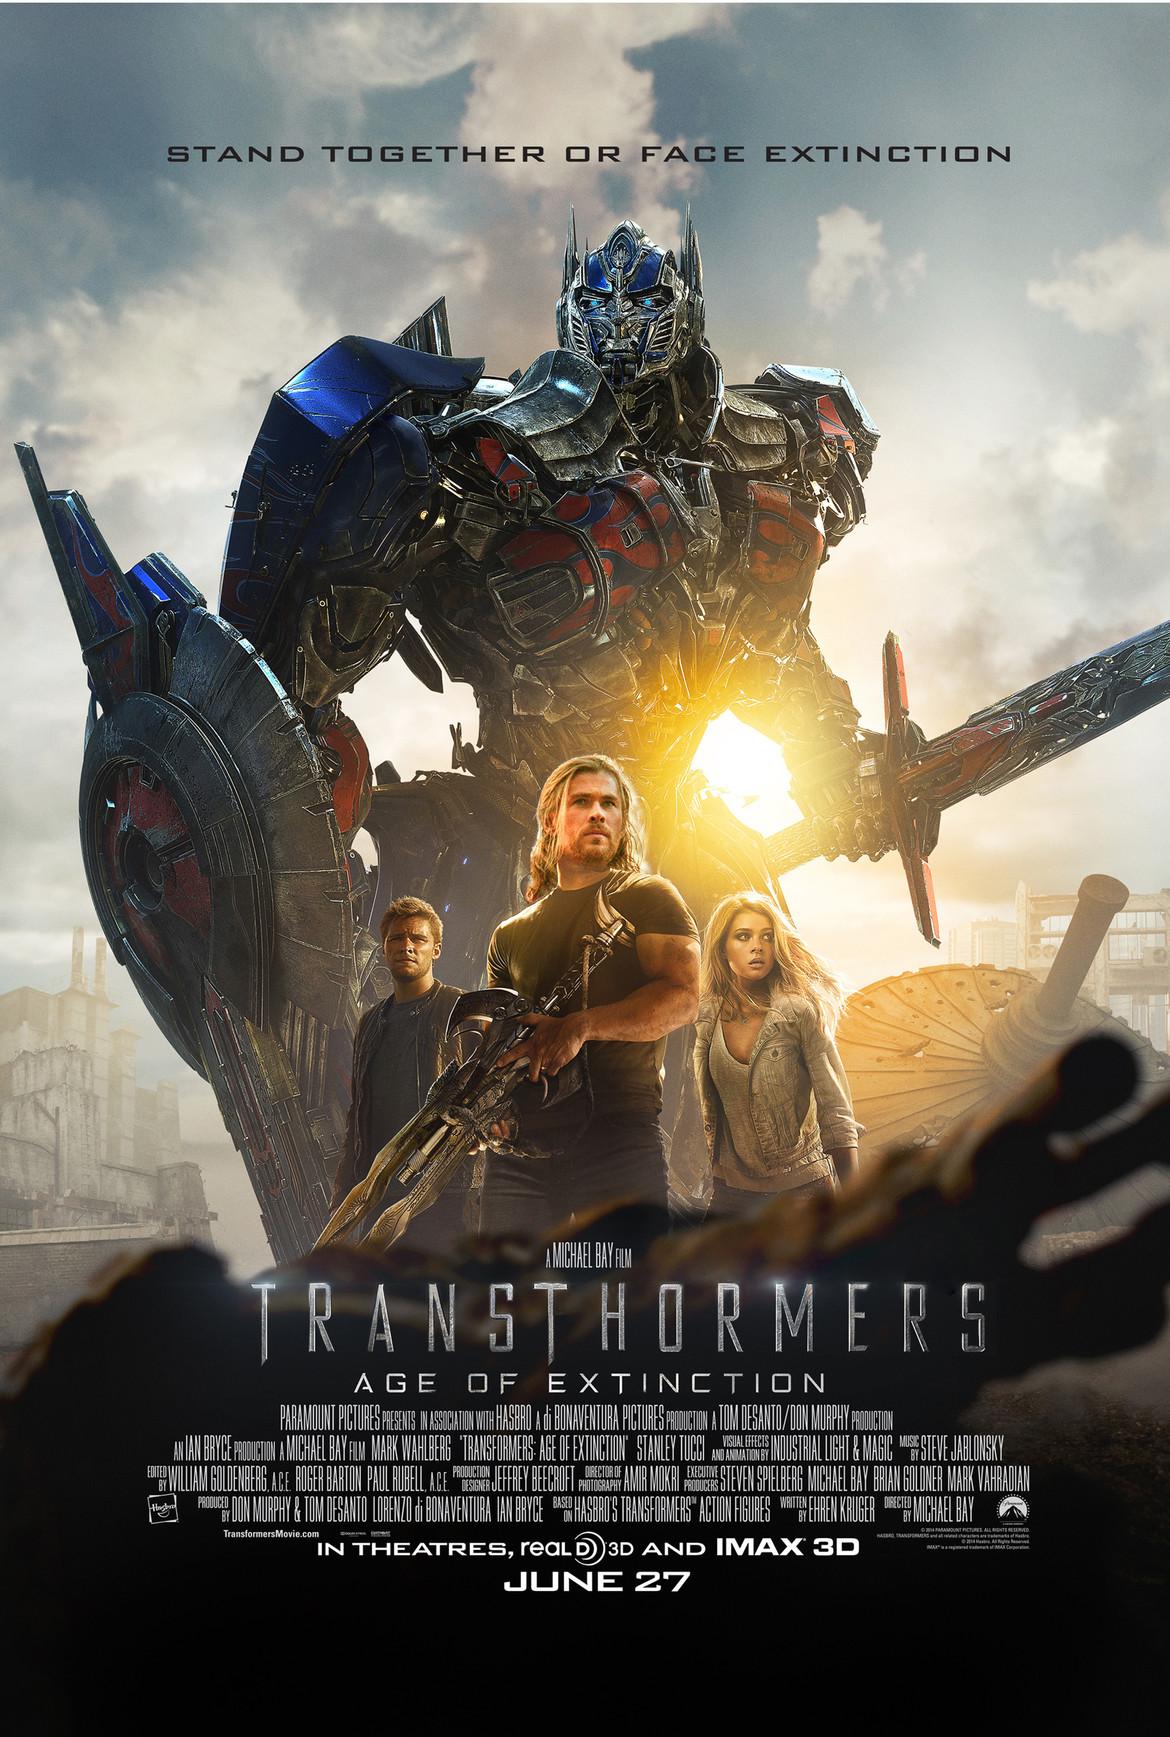 transthormers.jpg